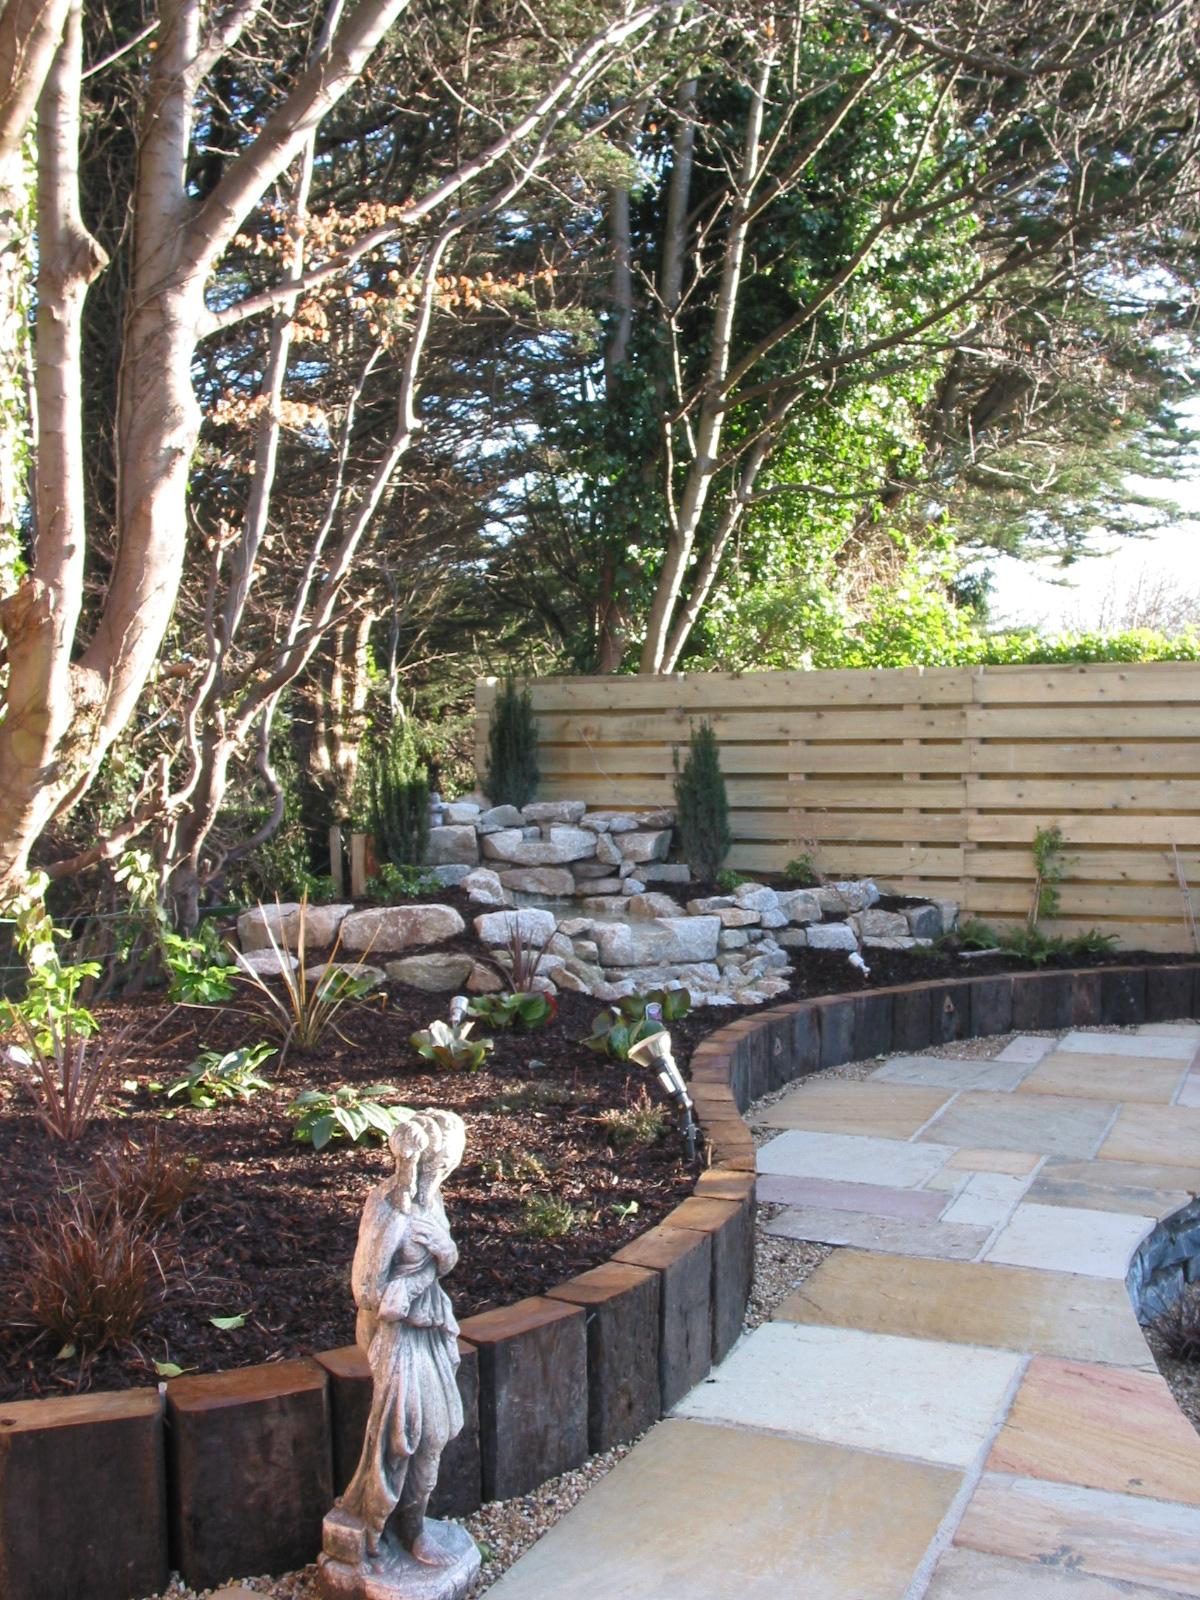 Deansgrange, Dublin, Ireland Landscaping Garden Design